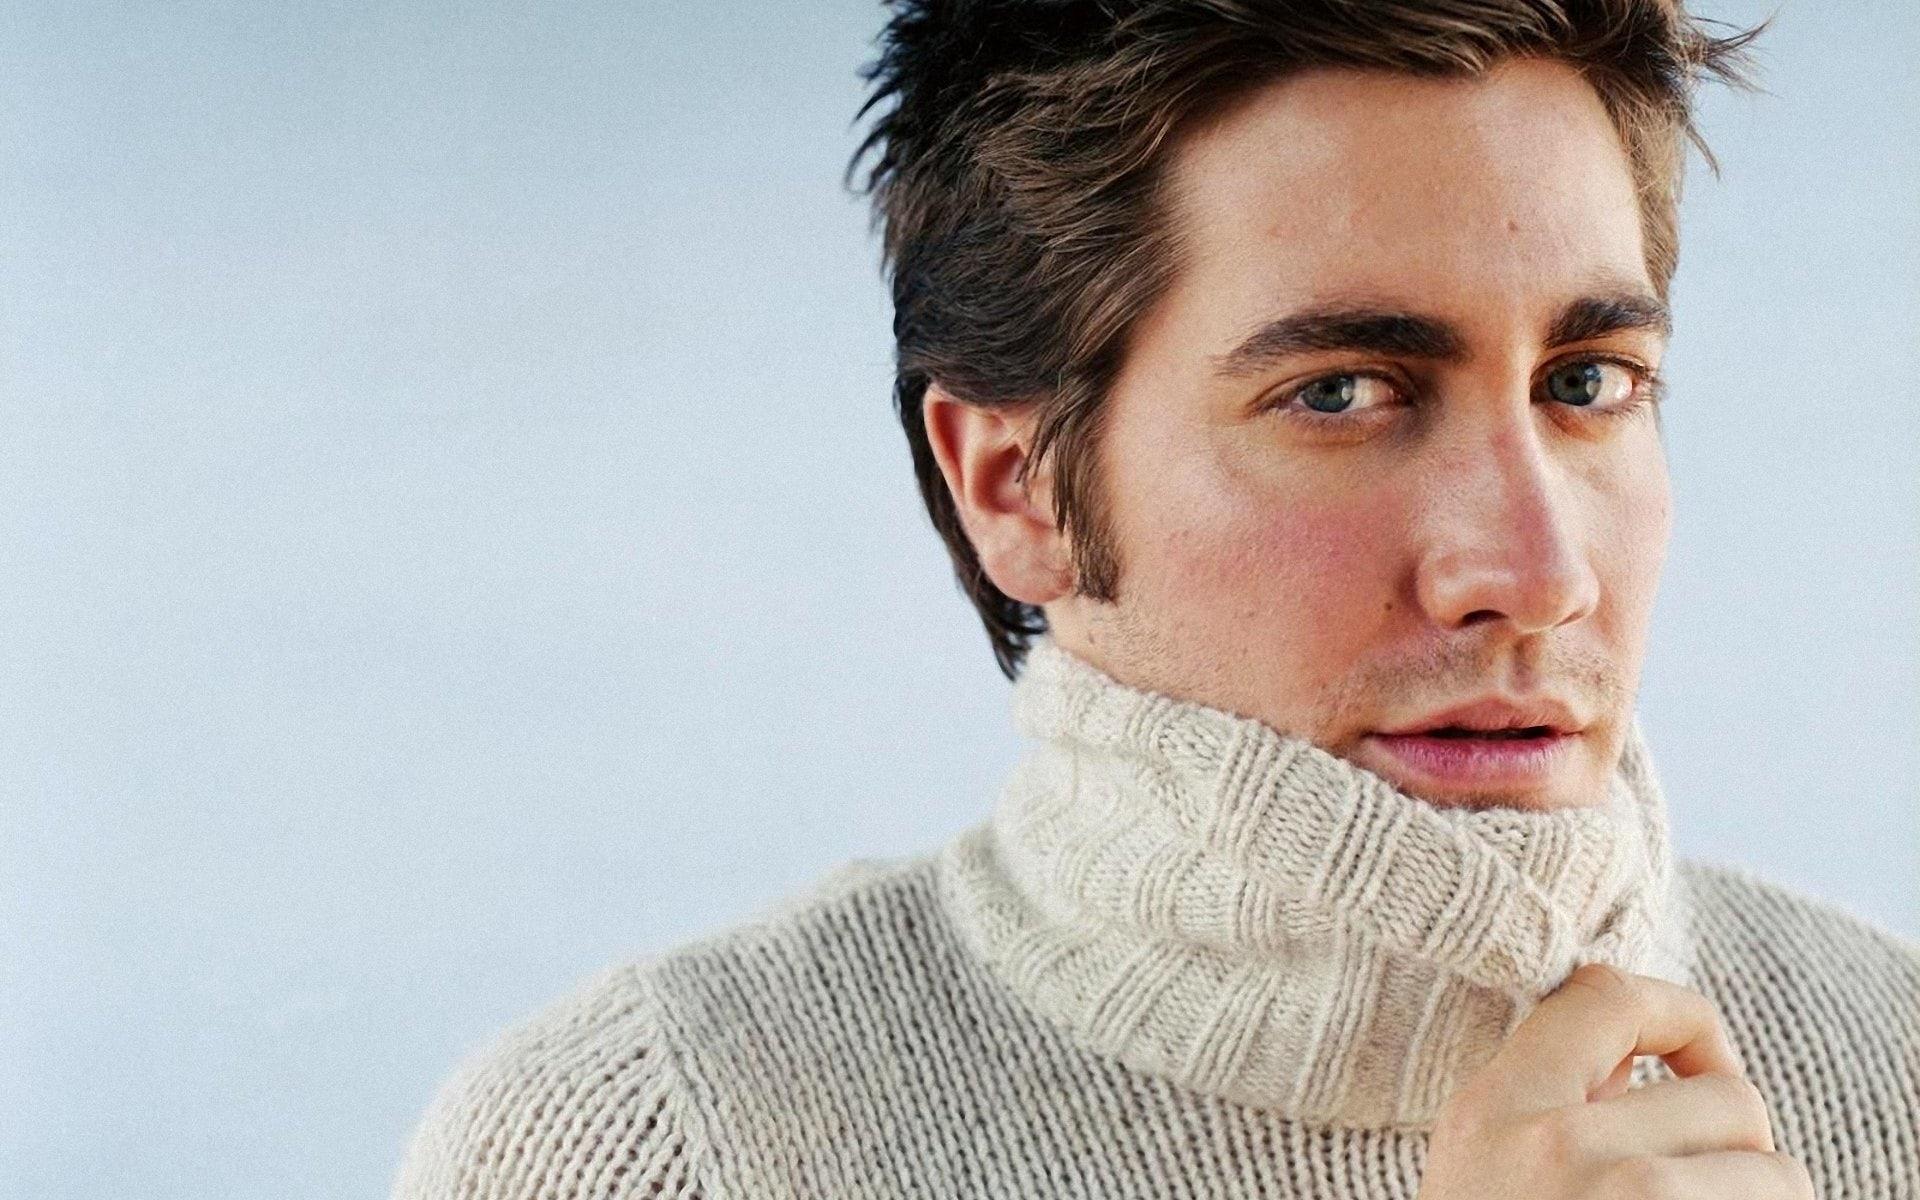 Jake Gyllenhaal Free